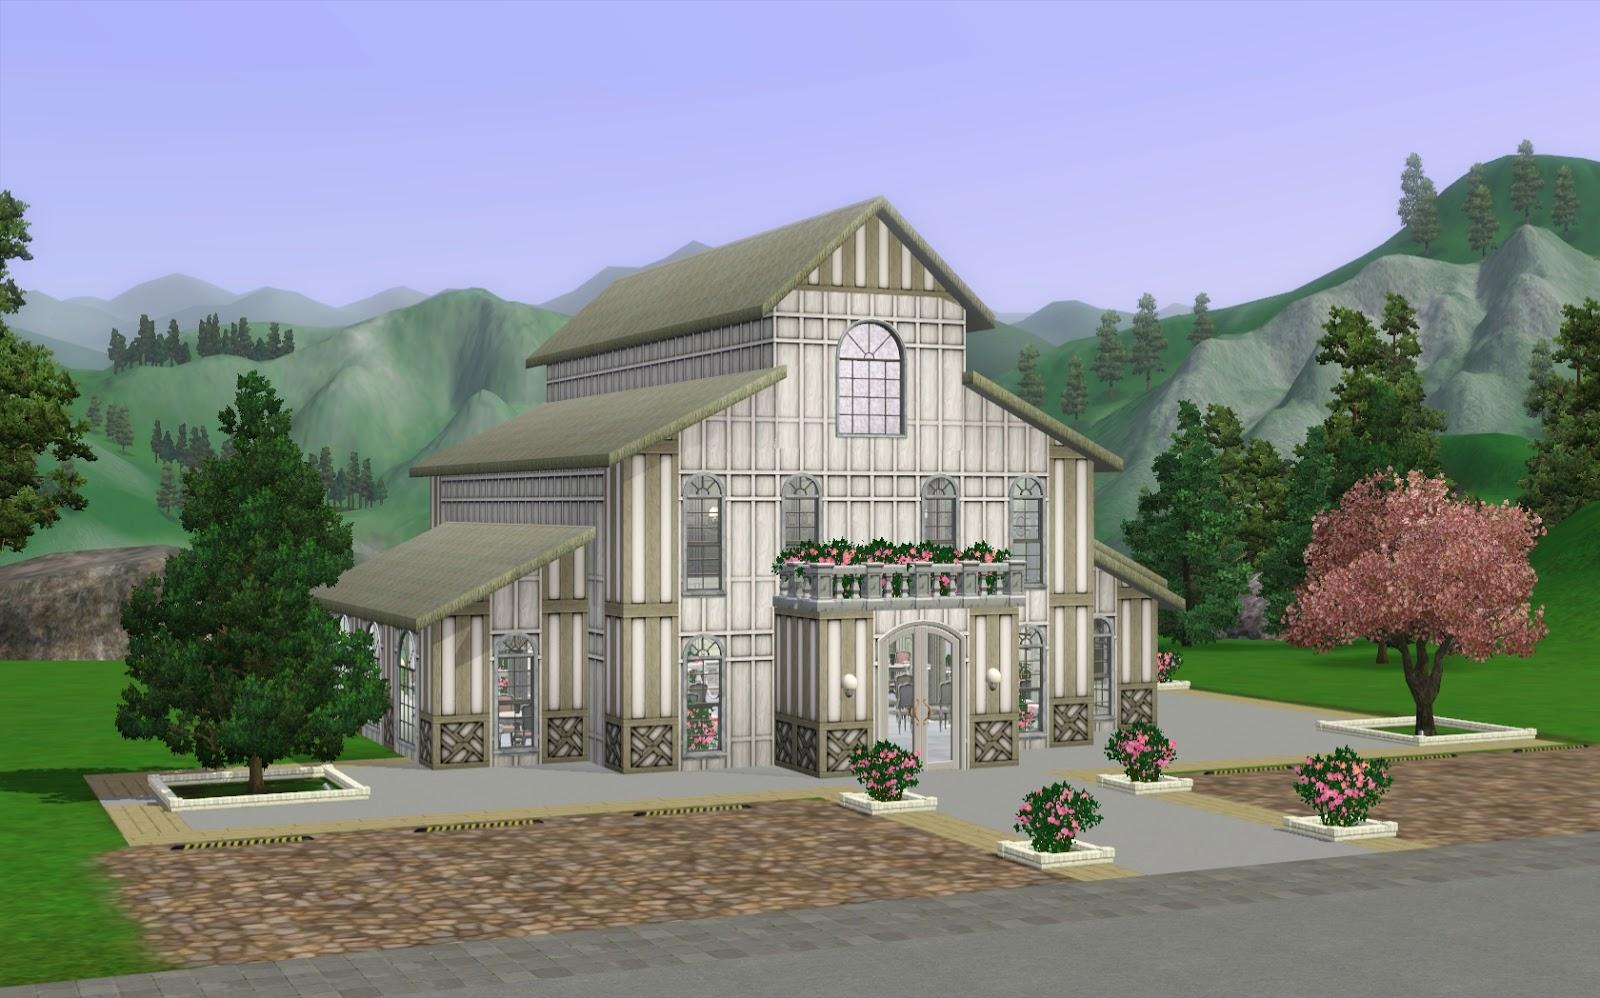 Summer's Little Sims 3 Garden: Dove's Blessing Wedding Chapel